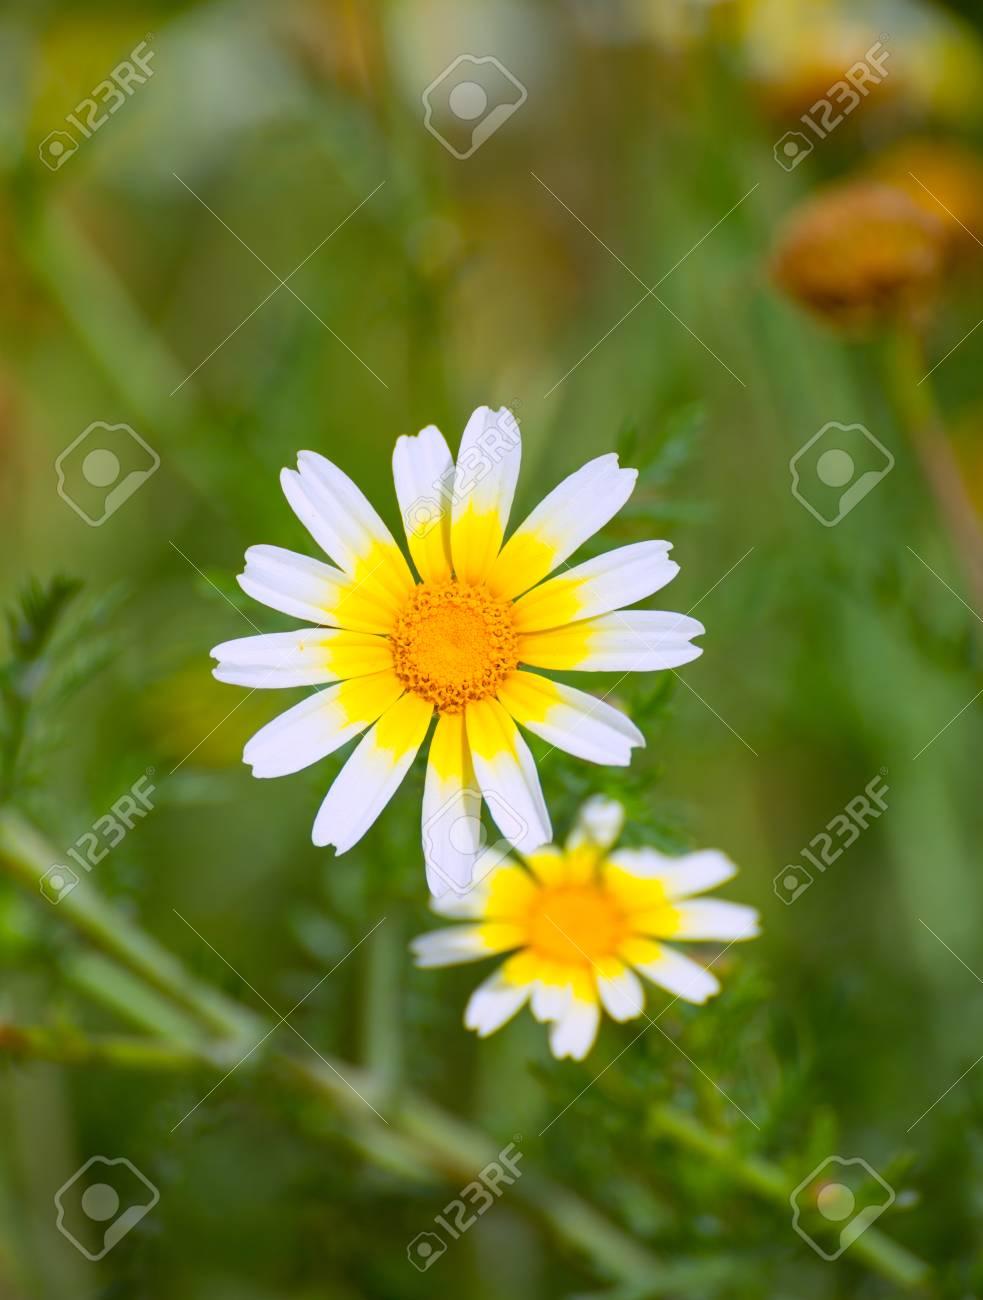 Menorca spring daisy white and yellow wild flowers in balearic menorca spring daisy white and yellow wild flowers in balearic islands stock photo 23733856 izmirmasajfo